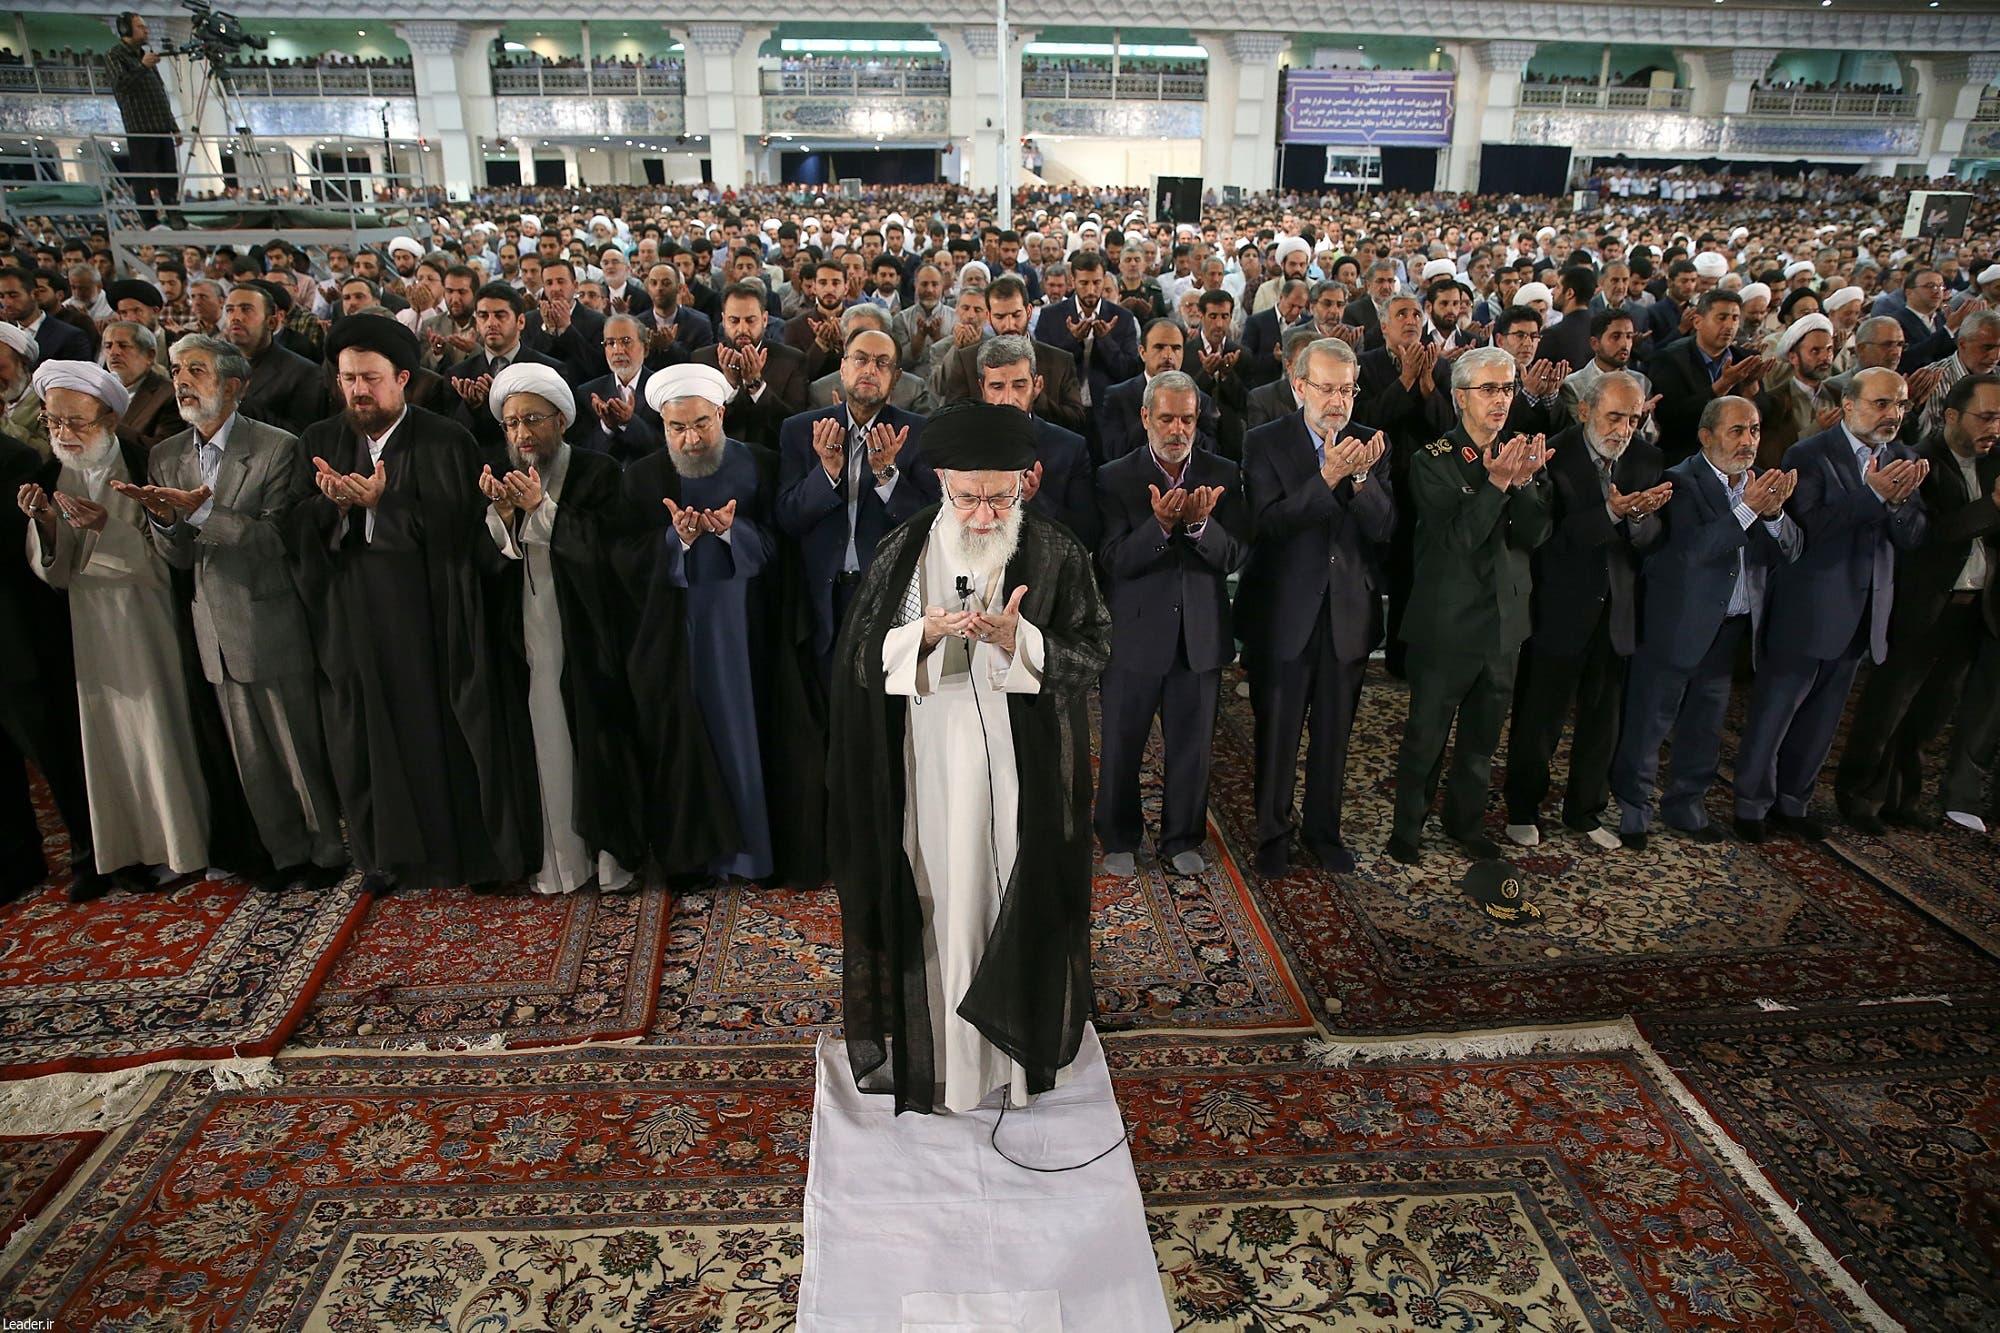 Iranian Supreme Leader Ayatollah Ali Khamenei leading the Eid al-Fitr prayers at the Imam Khomeini grand mosque in Tehran on June 26, 2017. (AFP)